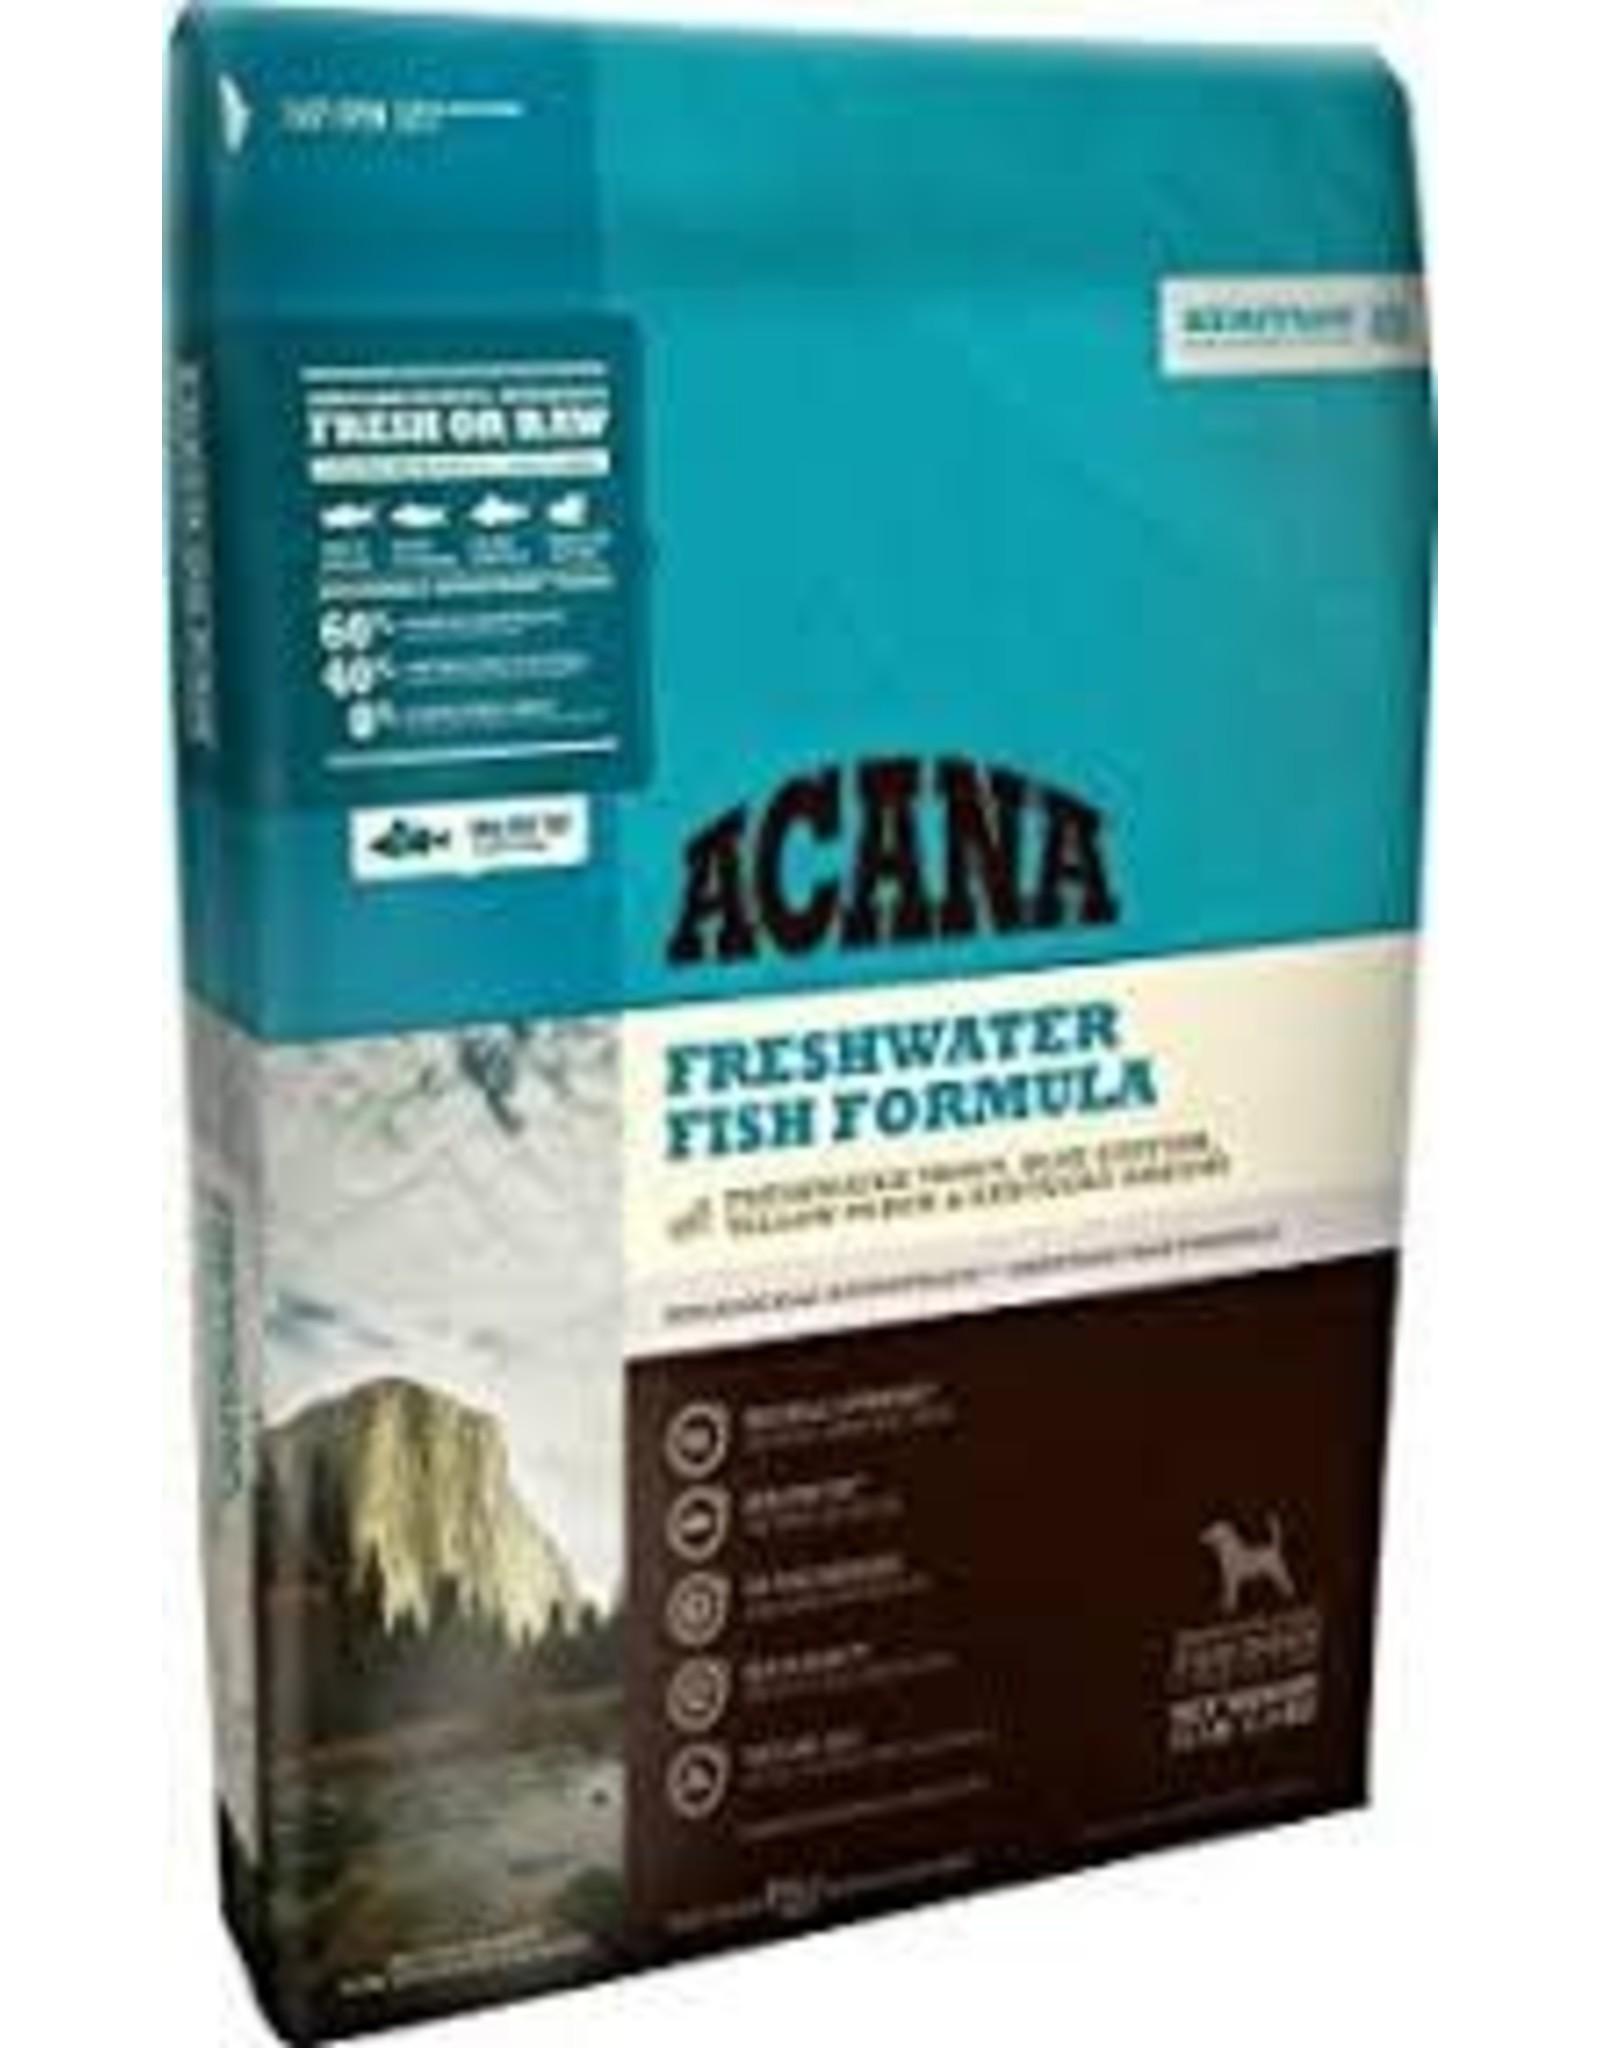 ACANA ACANA FRESHWATER FISH 25#